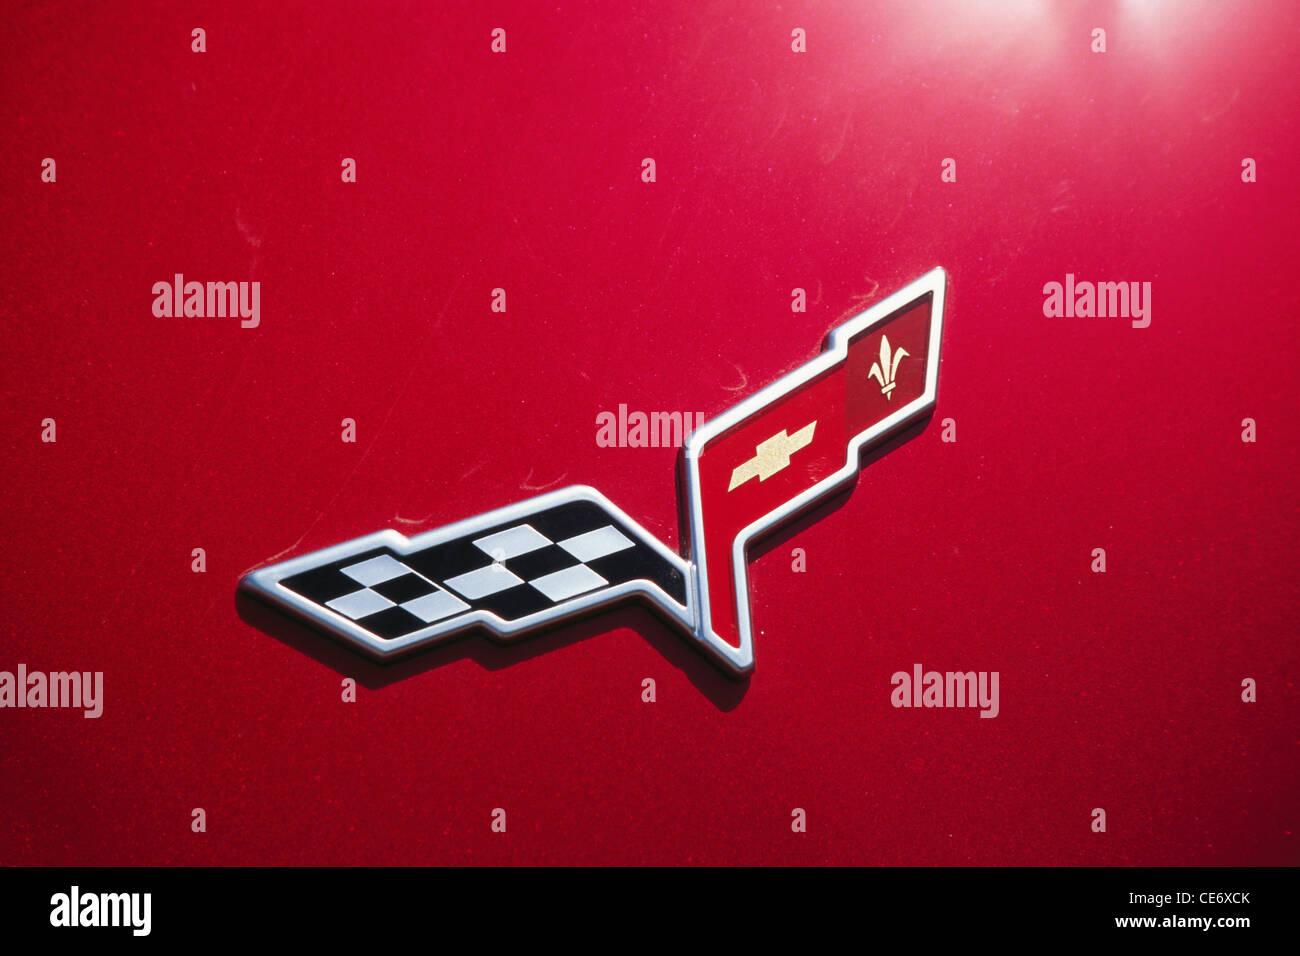 Corvette Stock Photos & Corvette Stock Images - Alamy